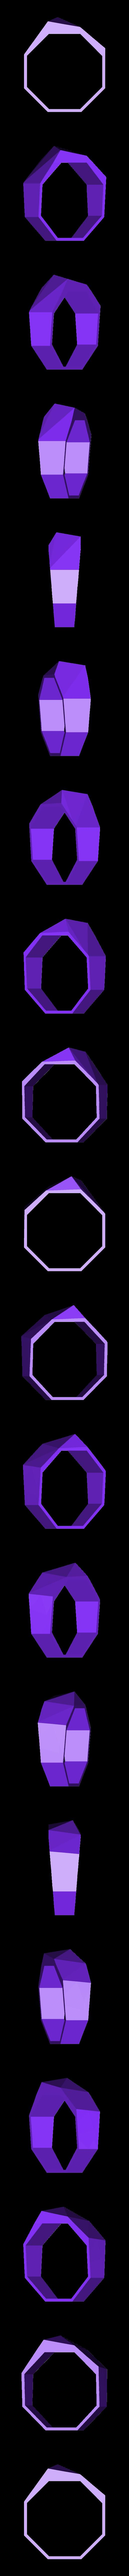 "02.stl Download free STL file the ""Bling Rings"" • 3D print model, leFabShop"